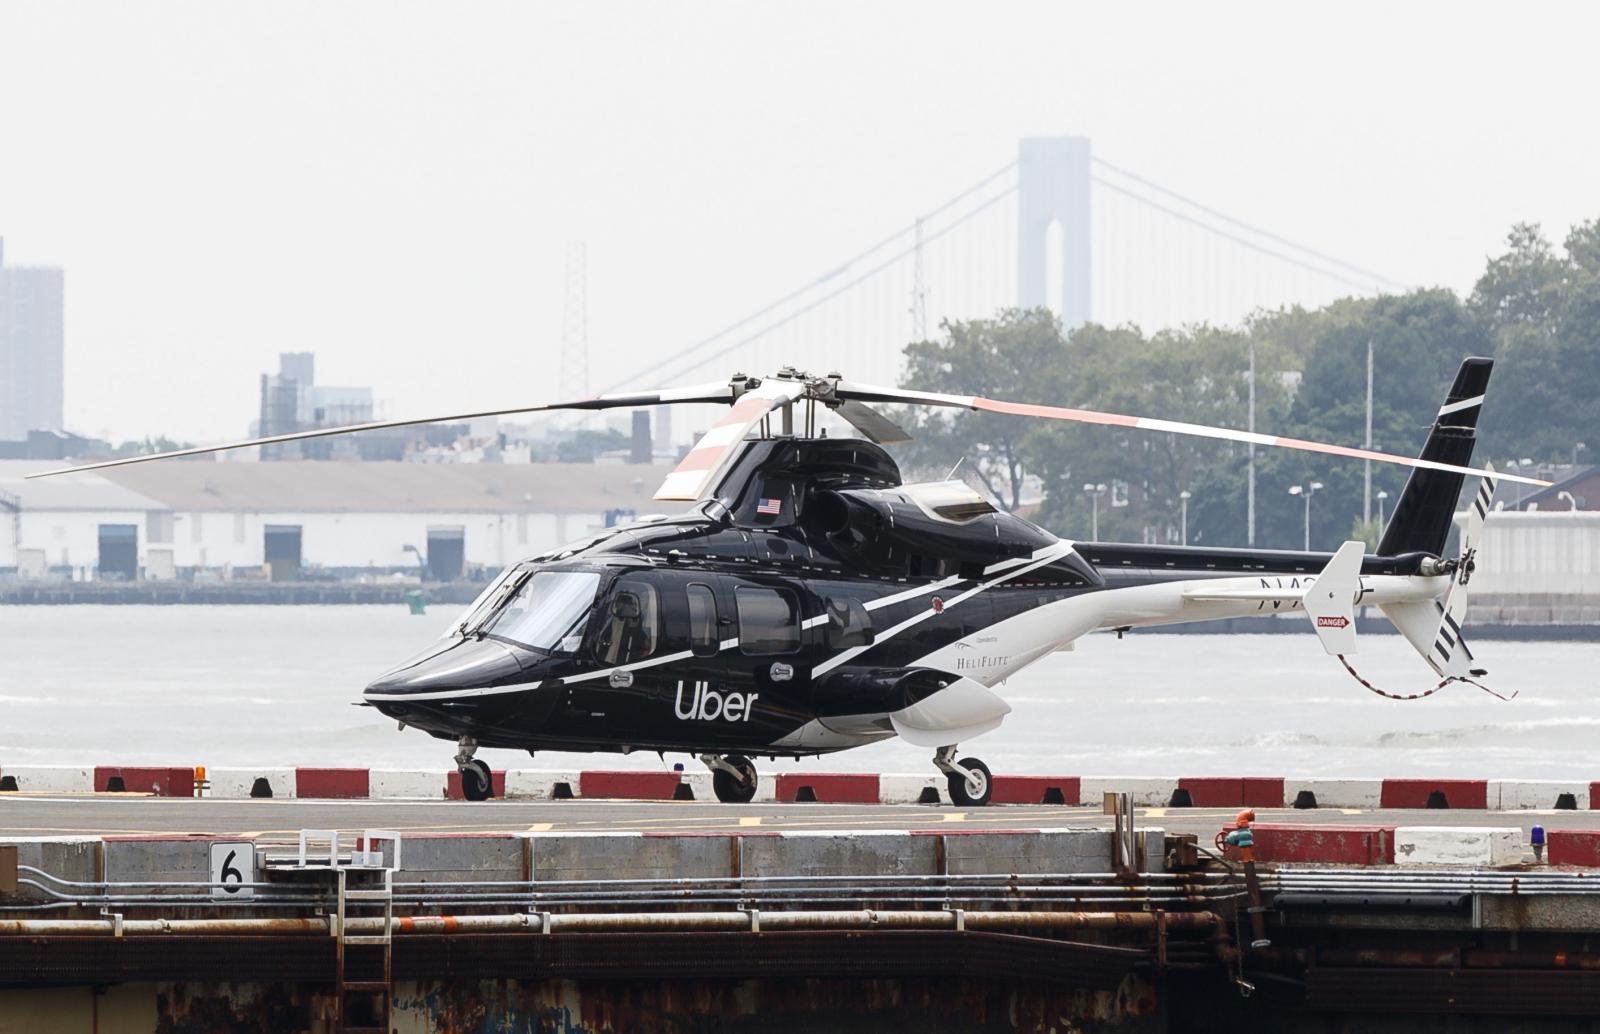 Serwisowany helikopter Fot. EPA/JUSTIN LANE